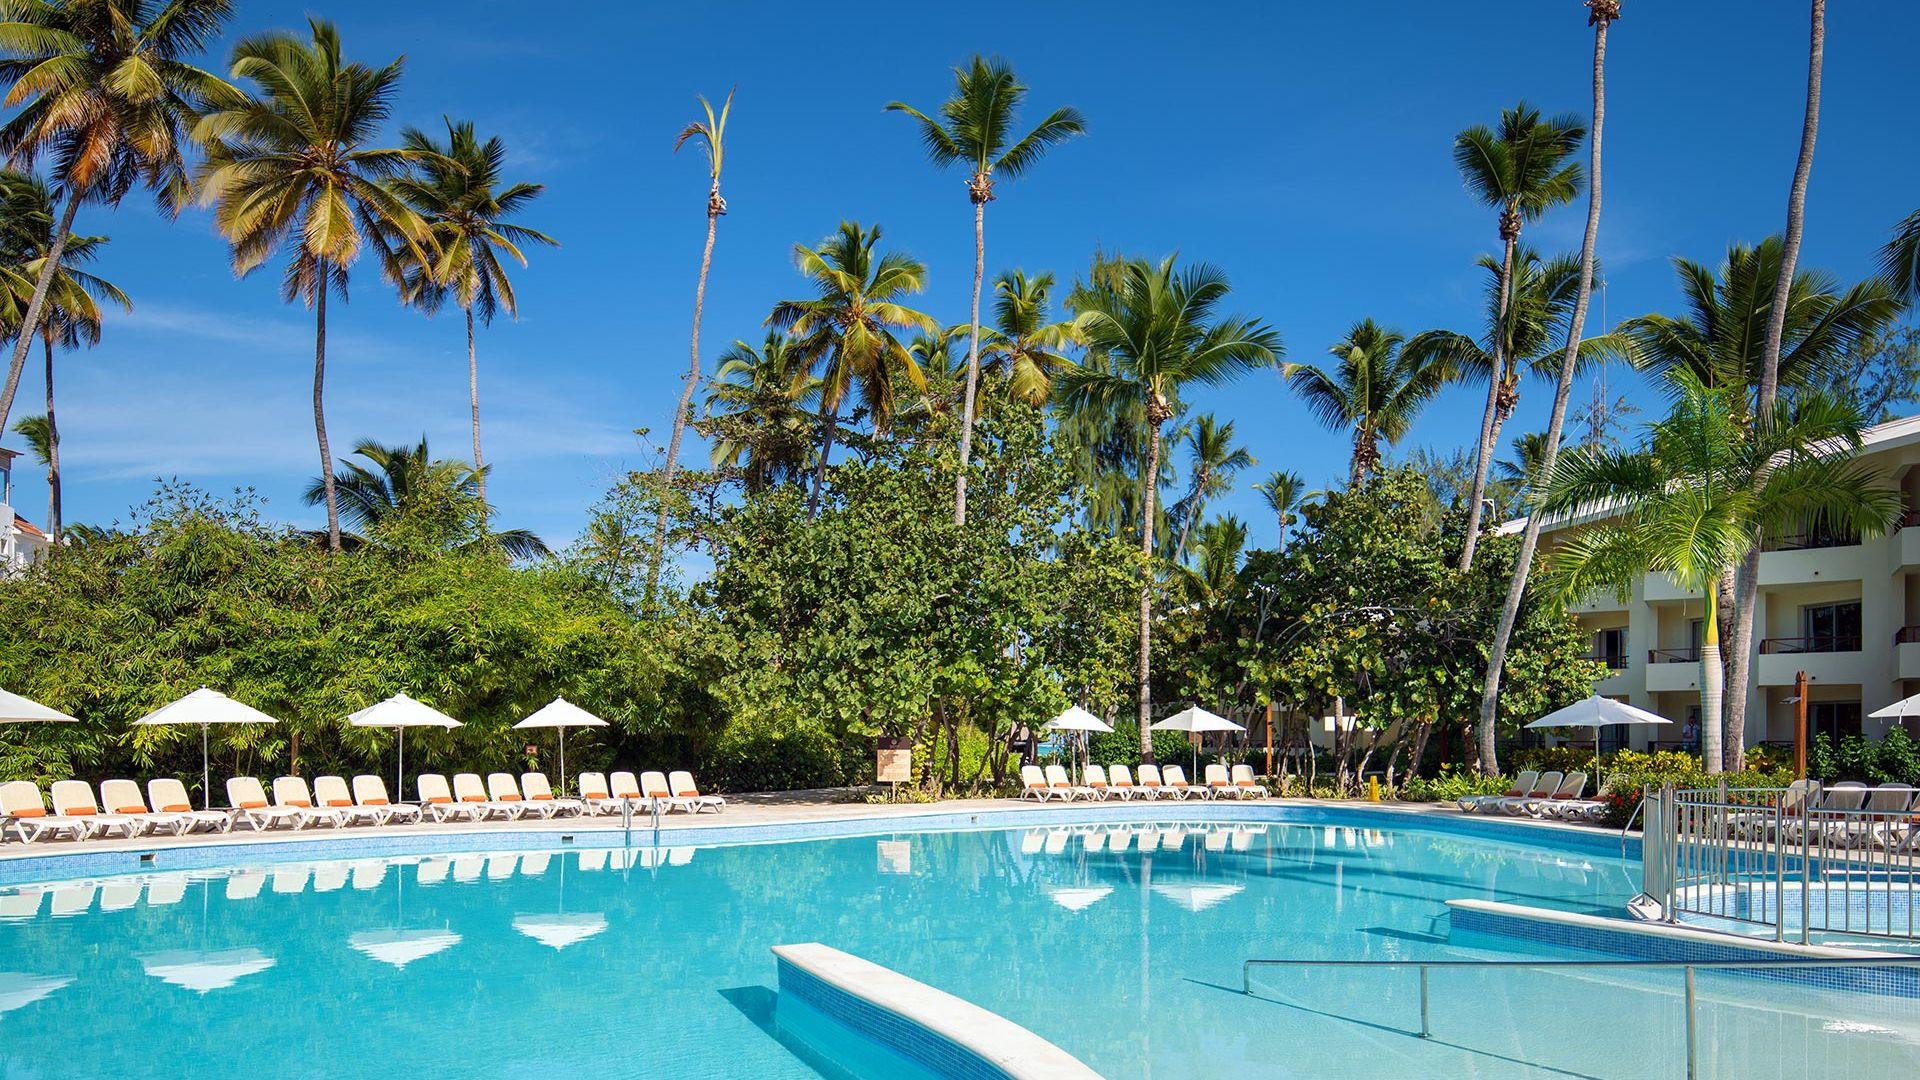 Craciun 2021 - Sejur charter Impressive Resort Punta Cana, 9 zile